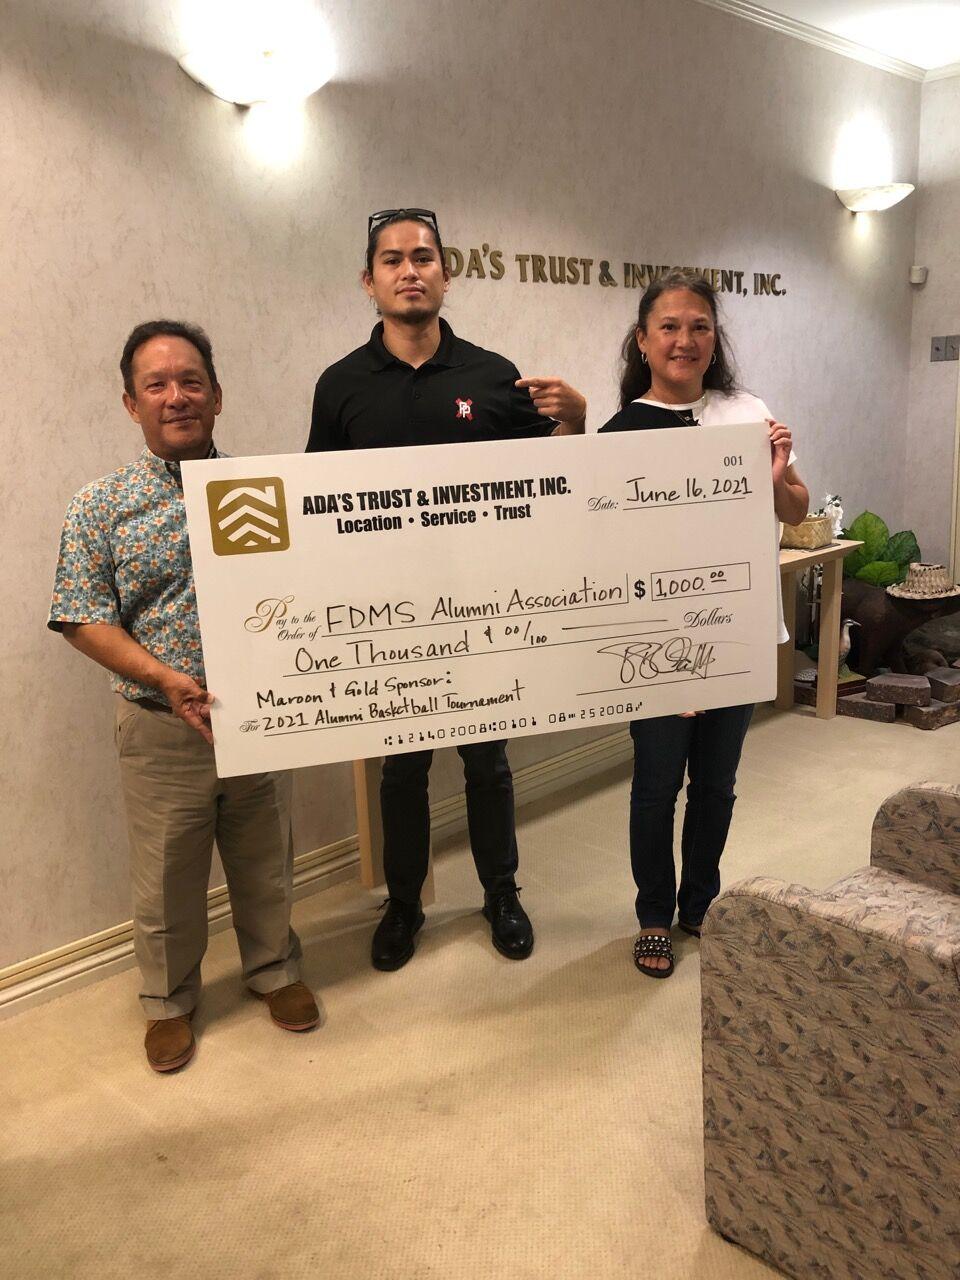 Ada's Trust and Investment donates to FDMS alumni tournament